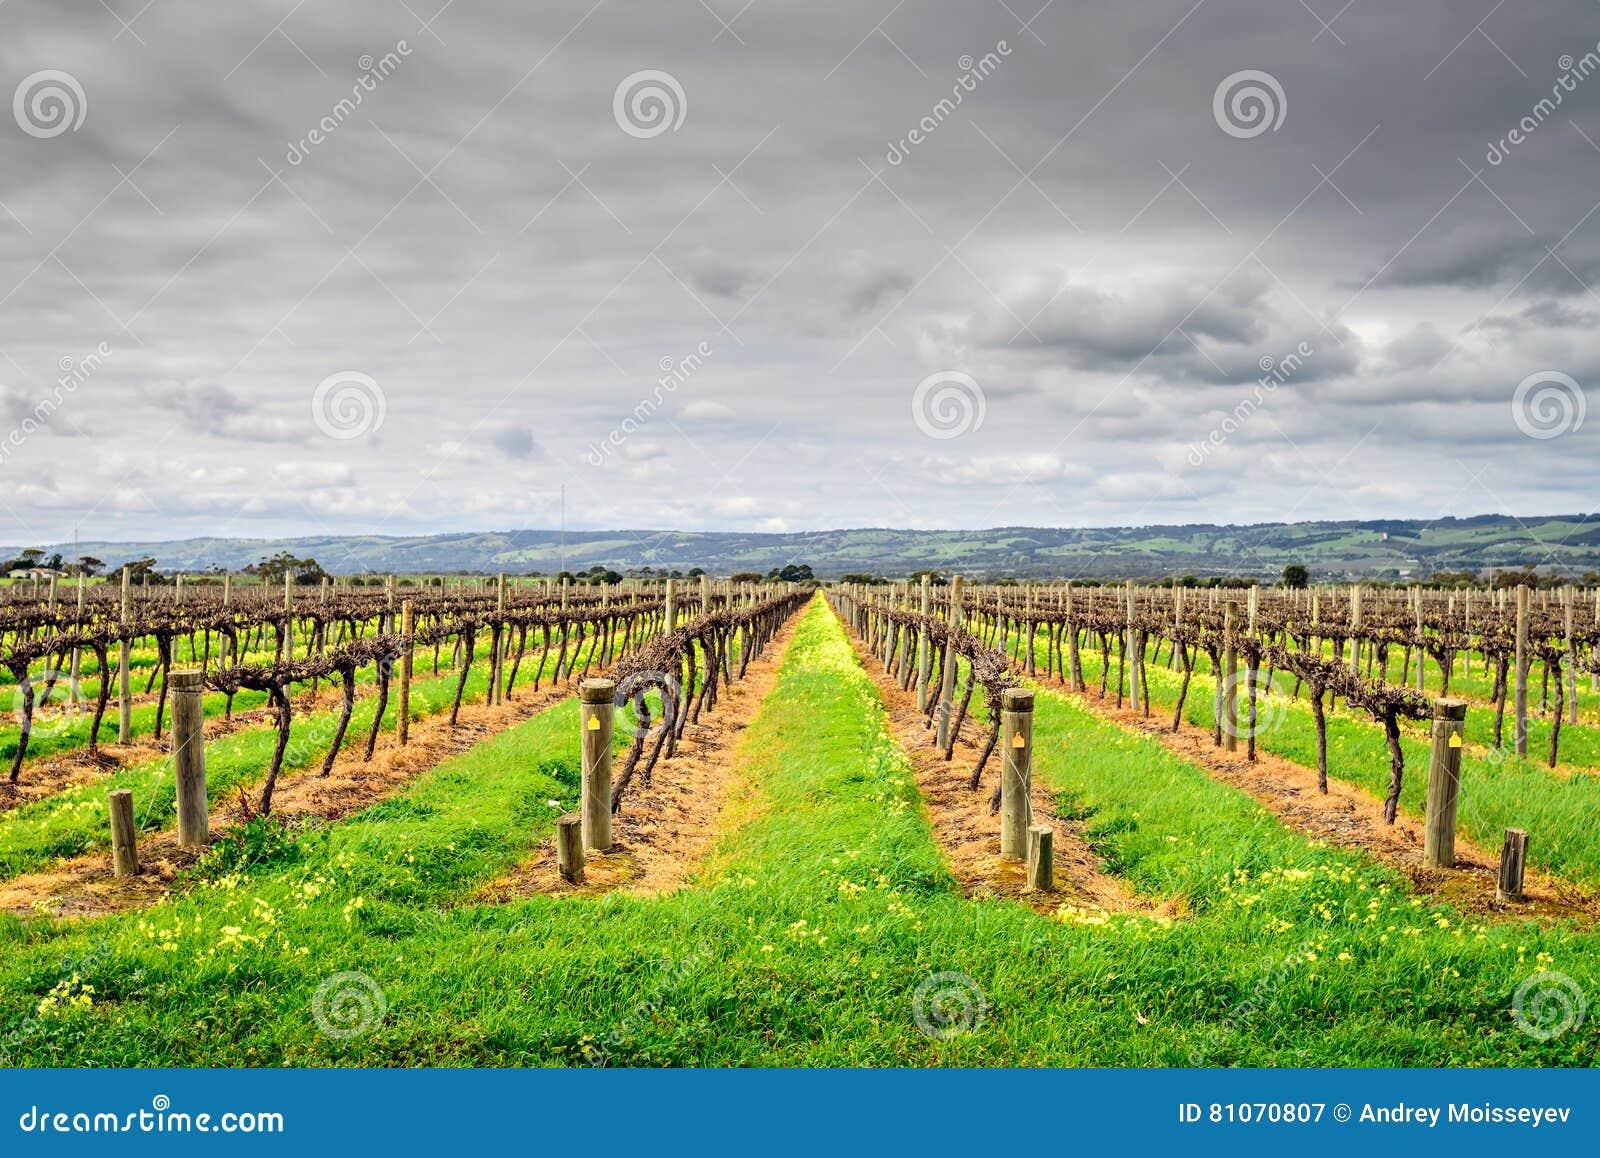 Mclaren Vale Wineries Stock Photo Image 81070807